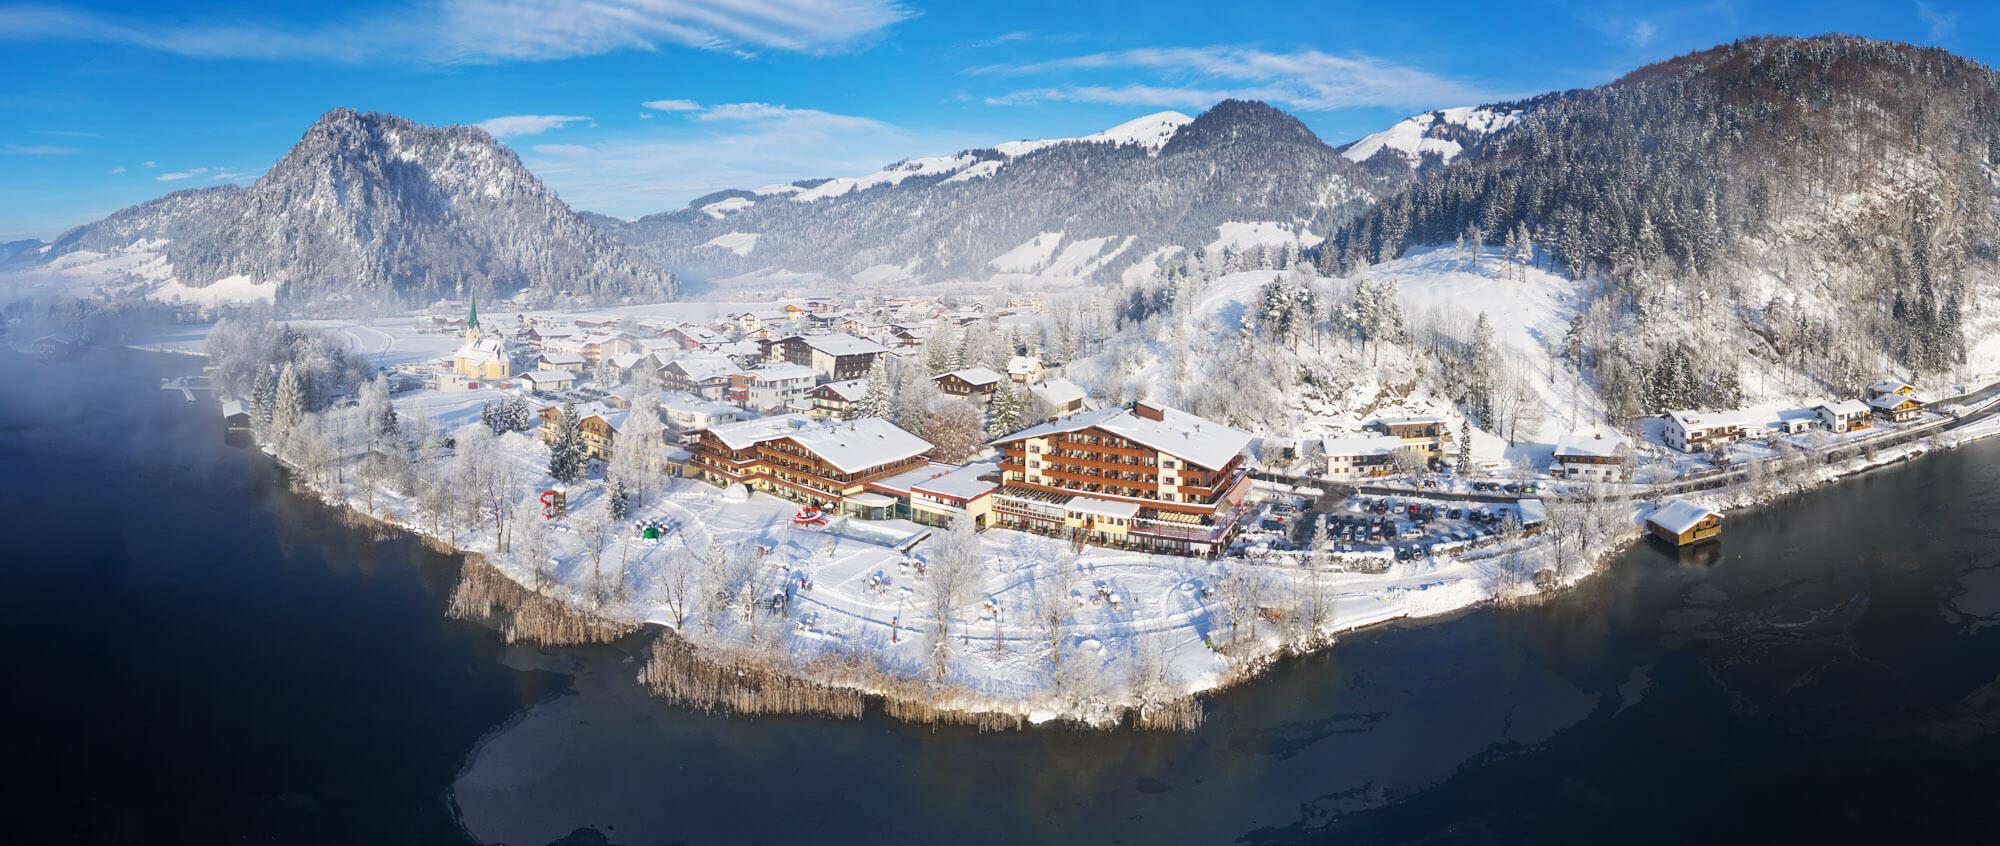 bellevue-walchsee-winter_web